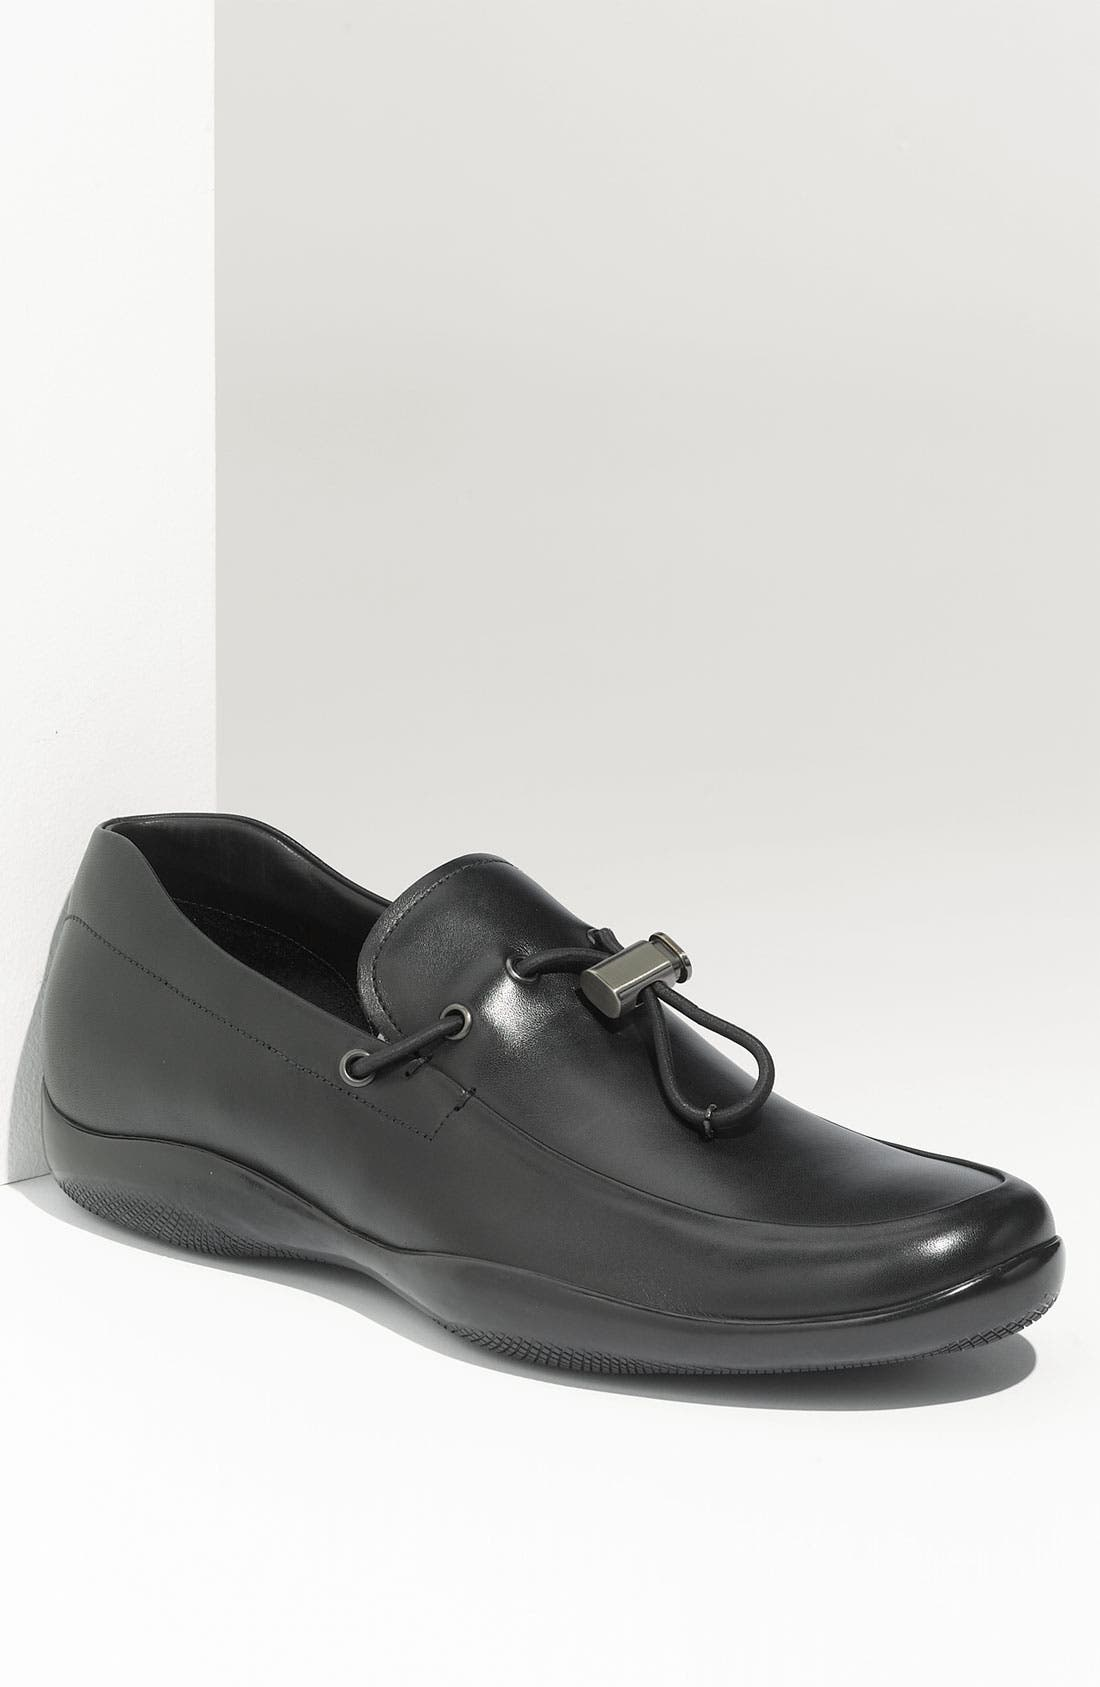 Alternate Image 1 Selected - Prada Leather Loafer